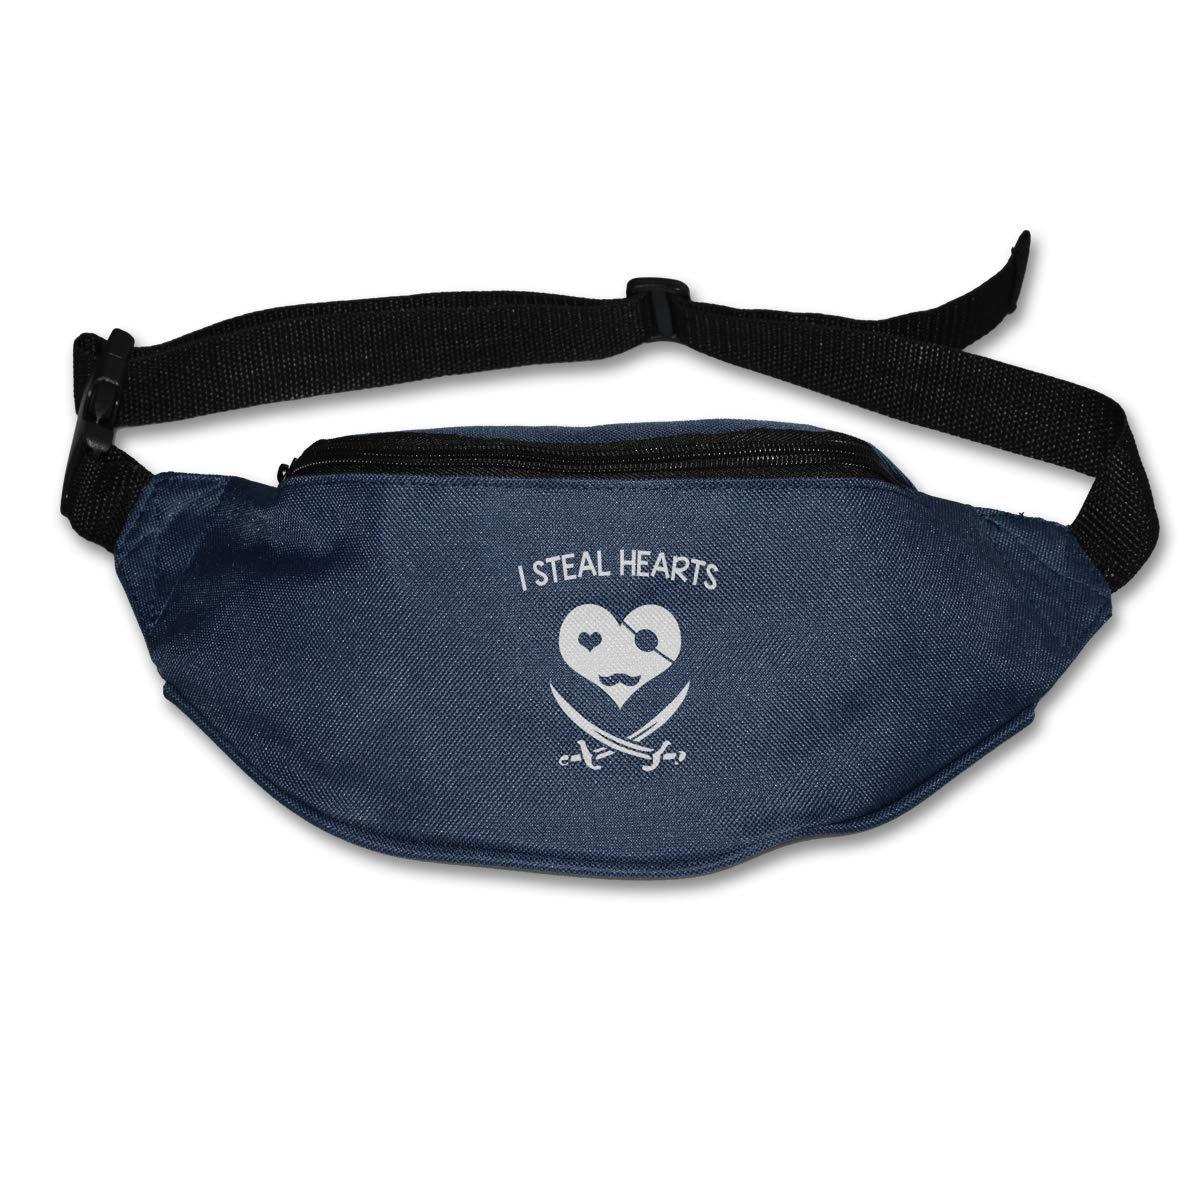 I Steal Hearts Sport Waist Pack Fanny Pack Adjustable For Travel